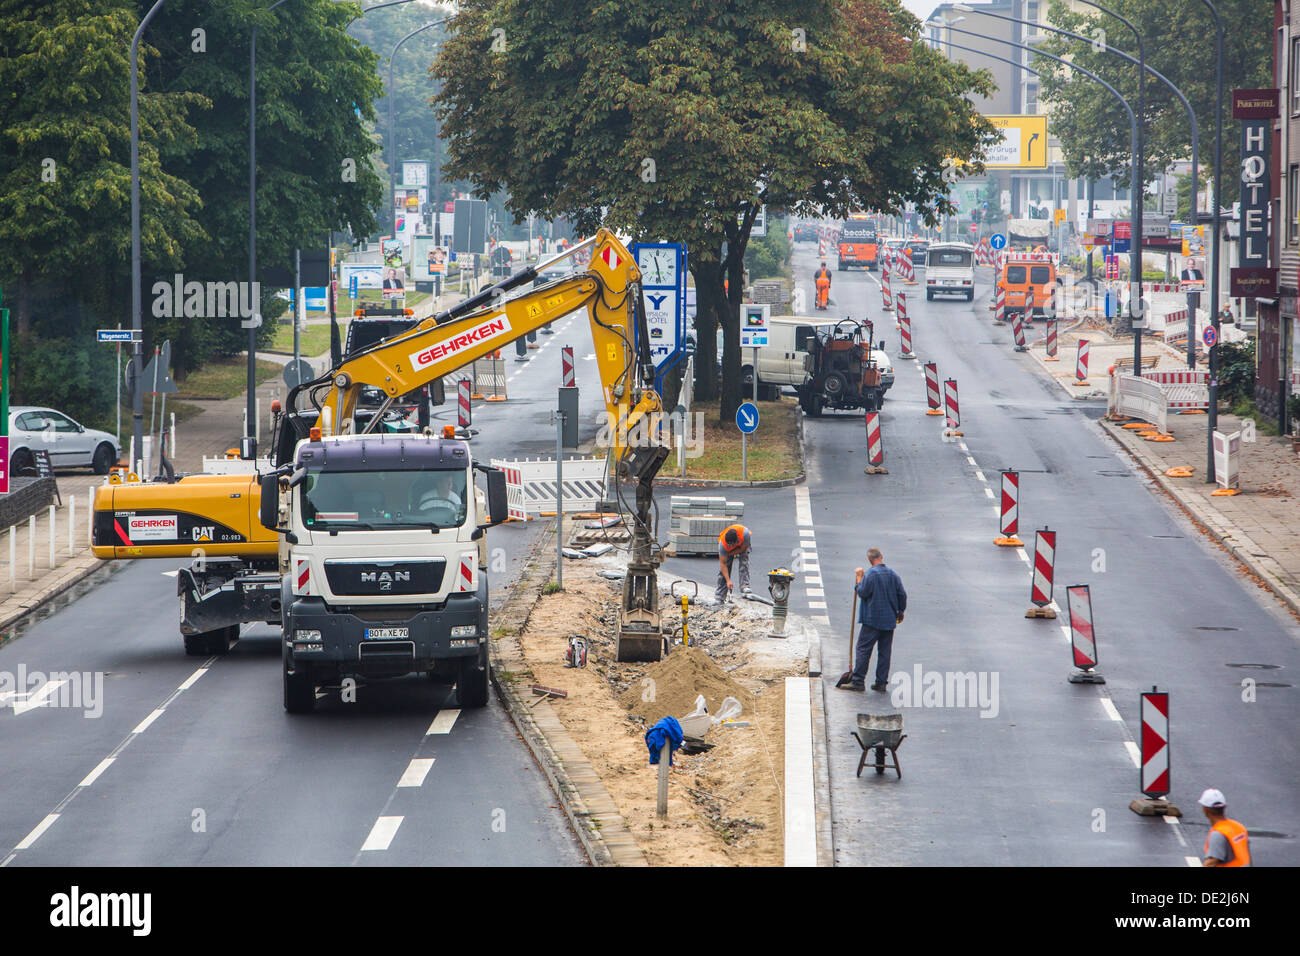 Inner-city road construction site. Asphalted work on a major road junction. New asphalt surface. Alfred Street, B224, in Essen. - Stock Image